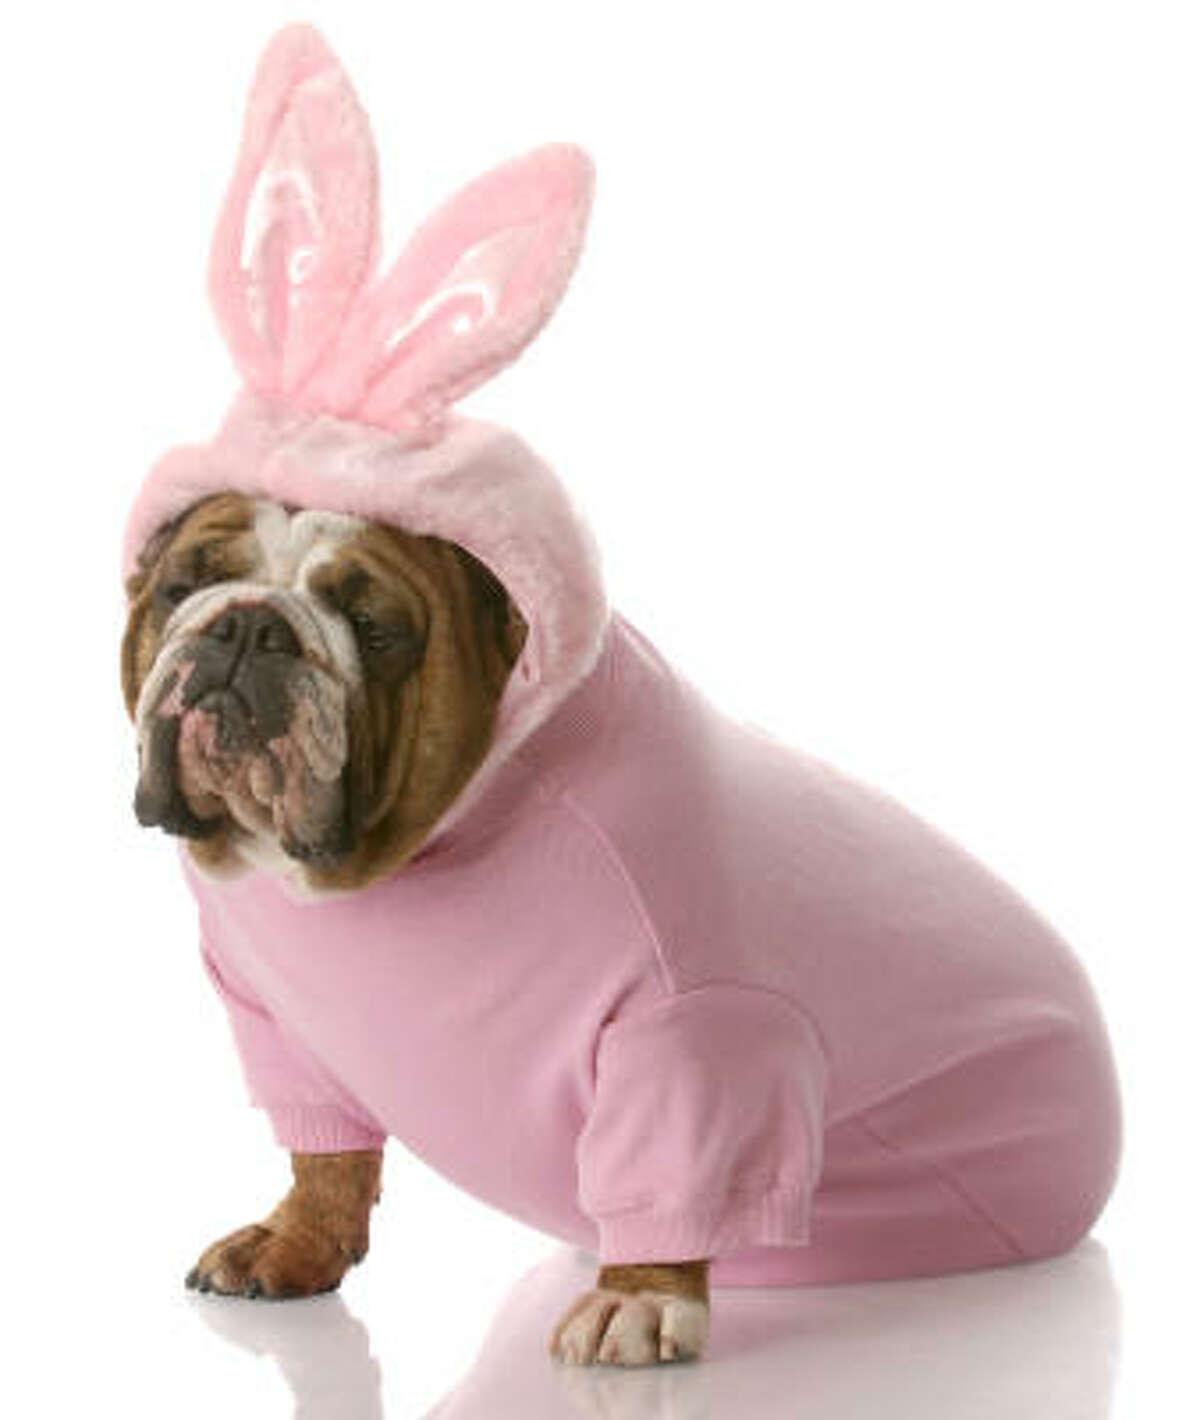 An English bulldog sports a pink bunny costume for Halloween.